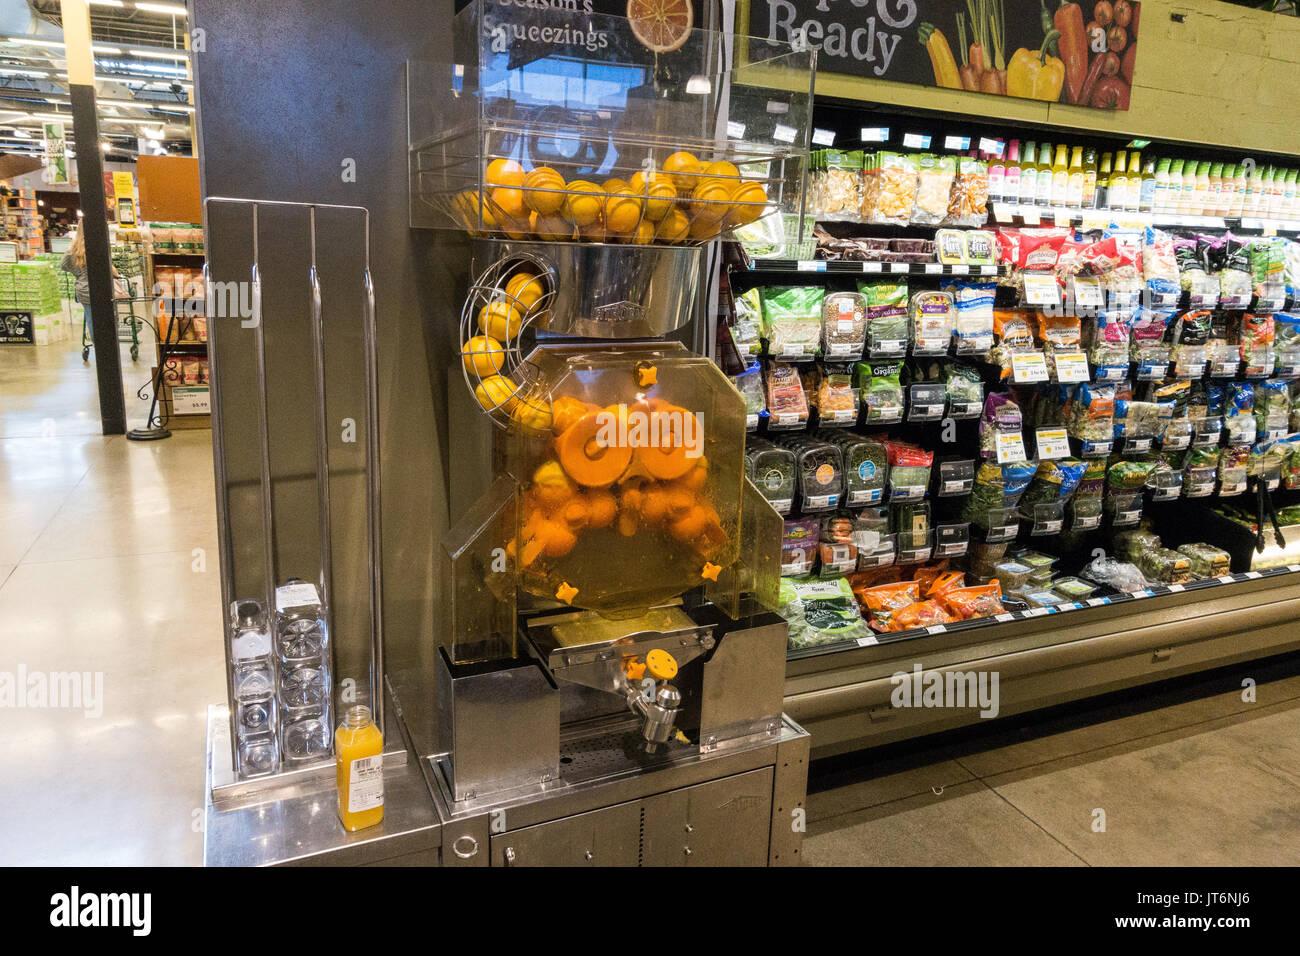 l servi orange machine jus d 39 orange frais press l. Black Bedroom Furniture Sets. Home Design Ideas